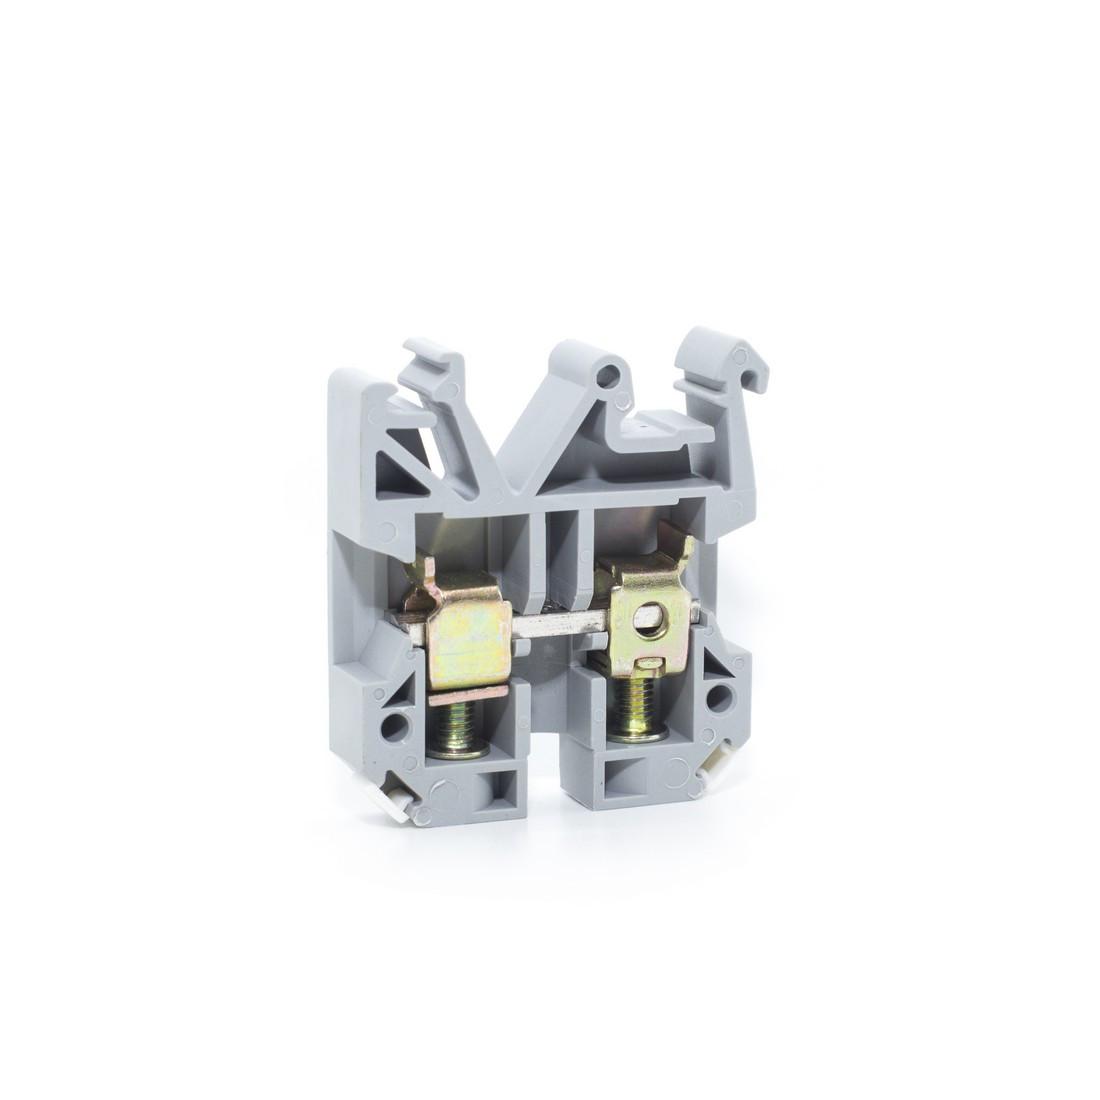 Клеммы и заглушки (JXB, URTK/S)